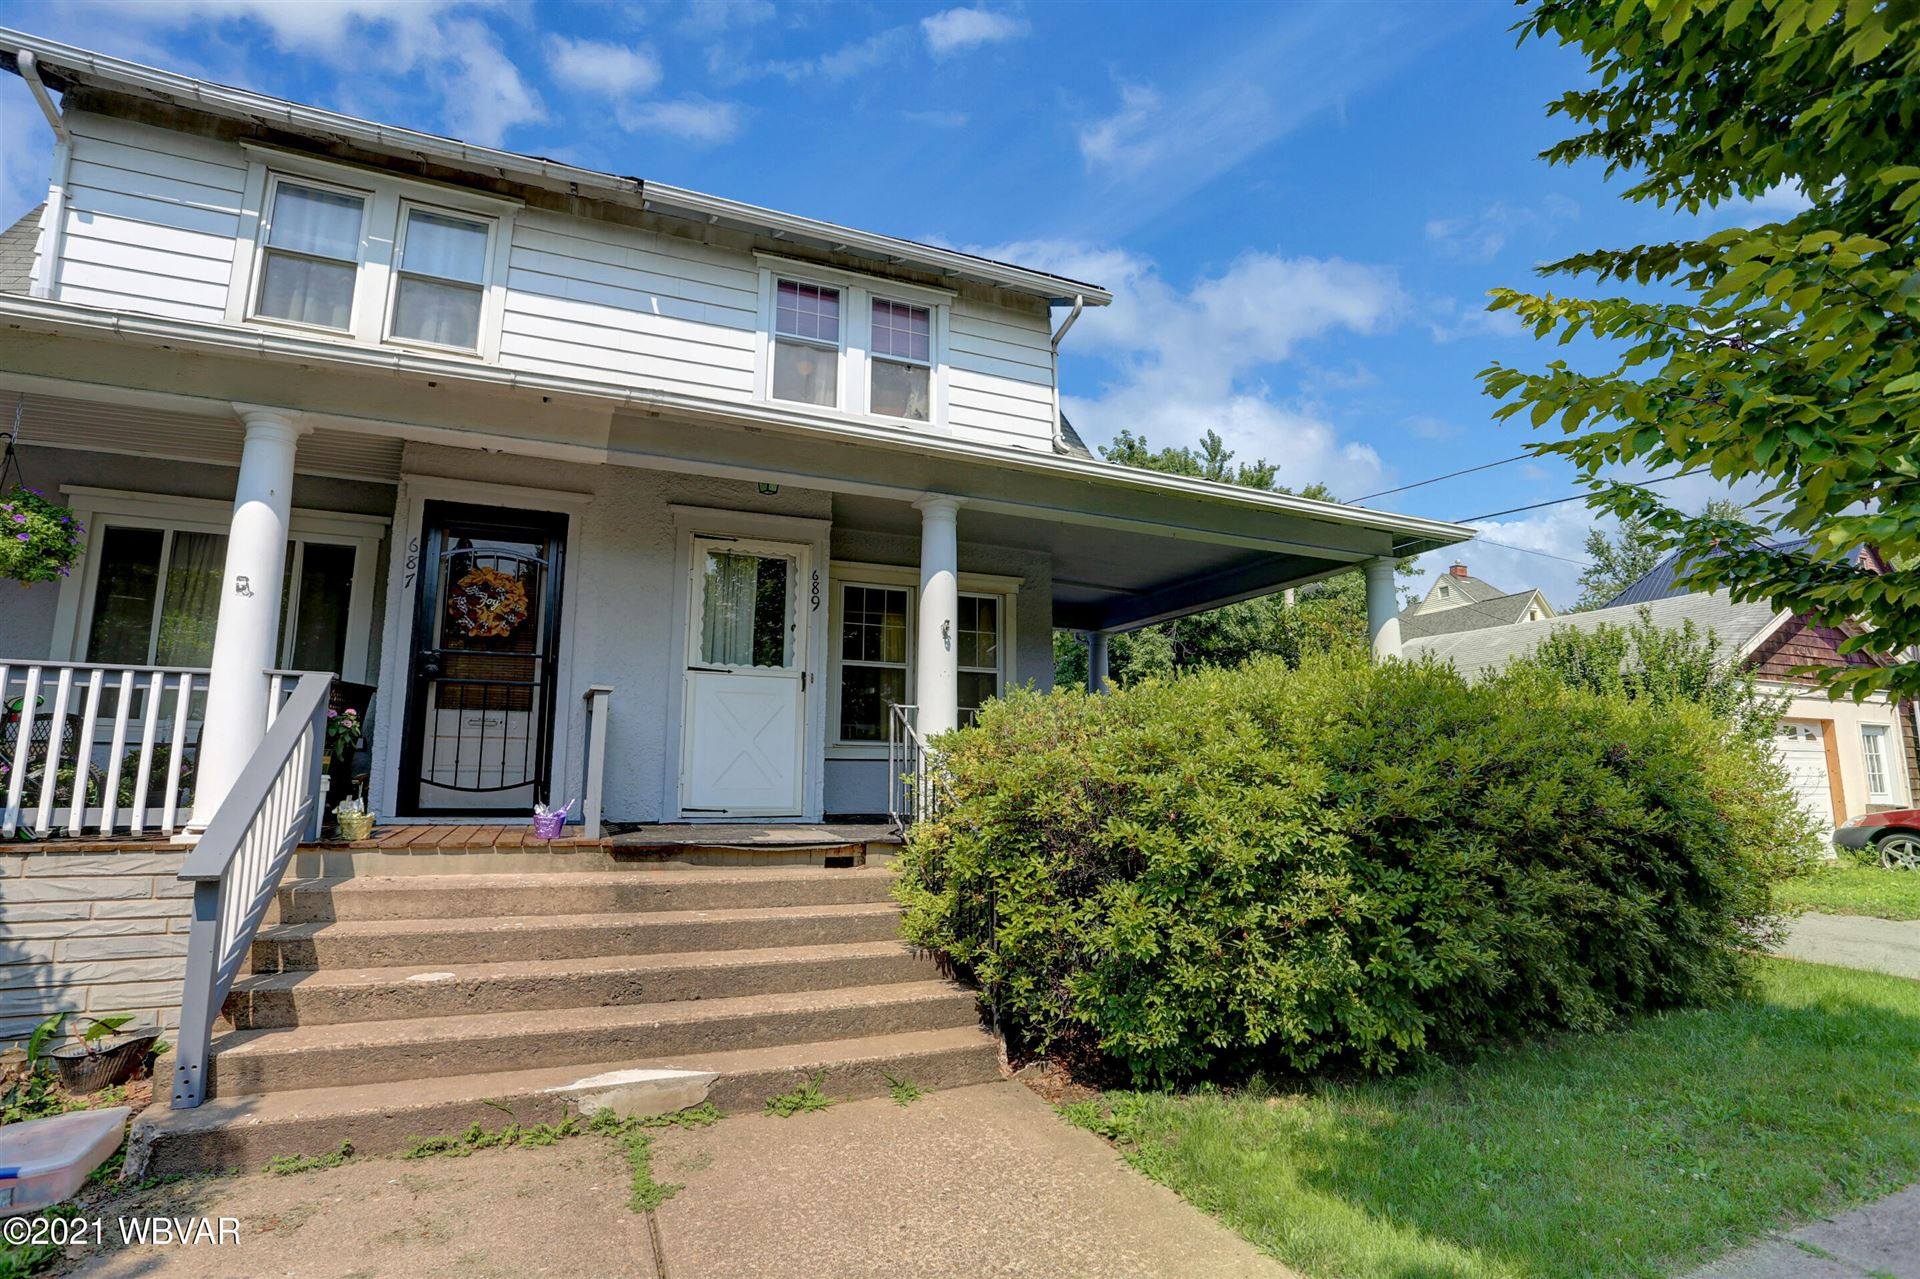 689 3RD AVENUE, Williamsport, PA 17701 - #: WB-92963